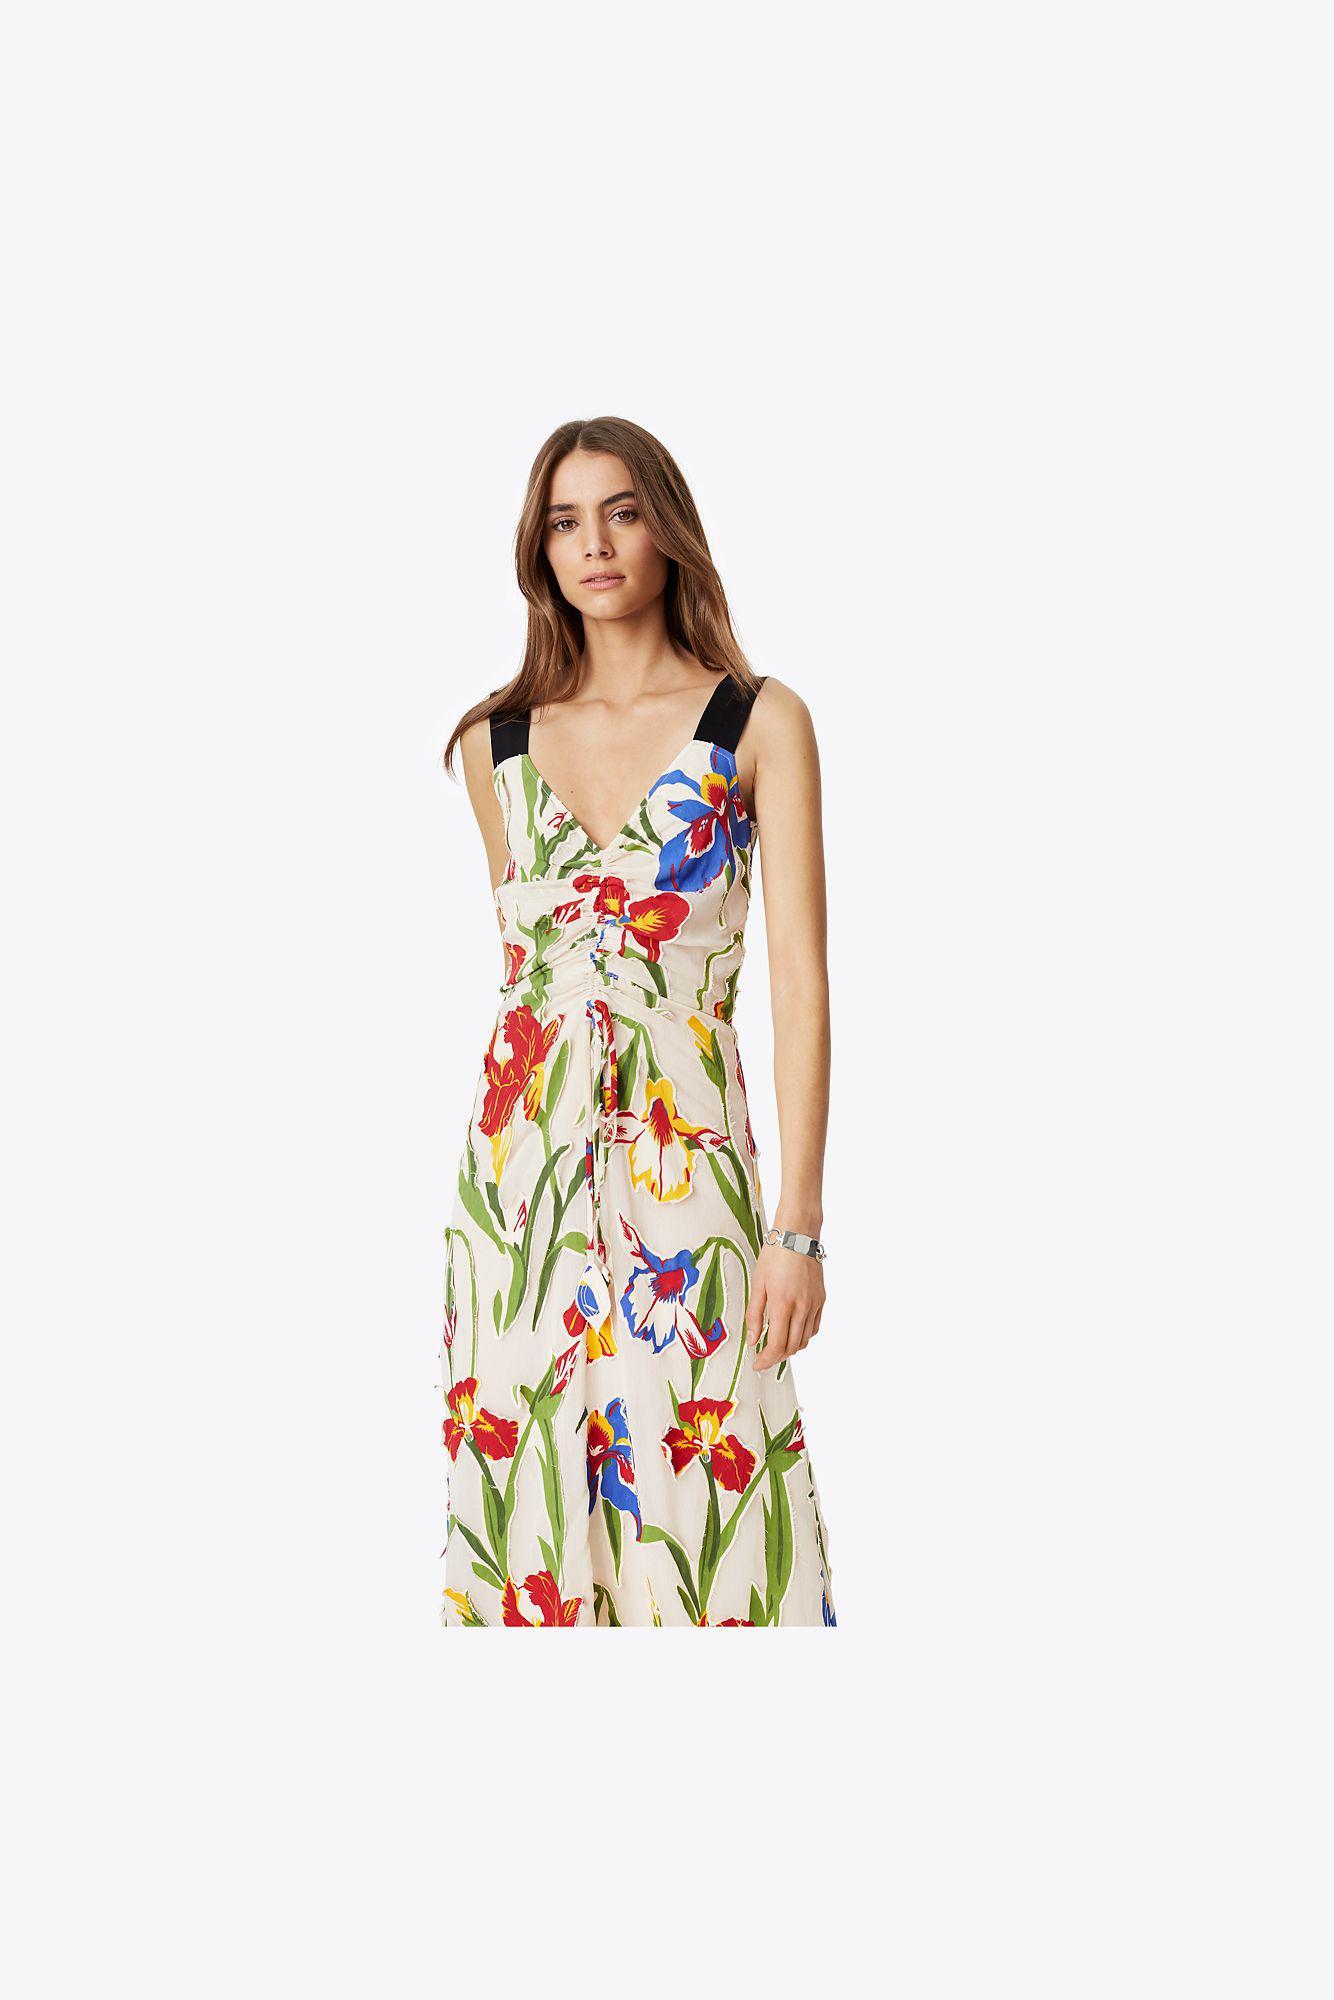 b624bada75 Tory Burch Clarissa Dress - Lyst